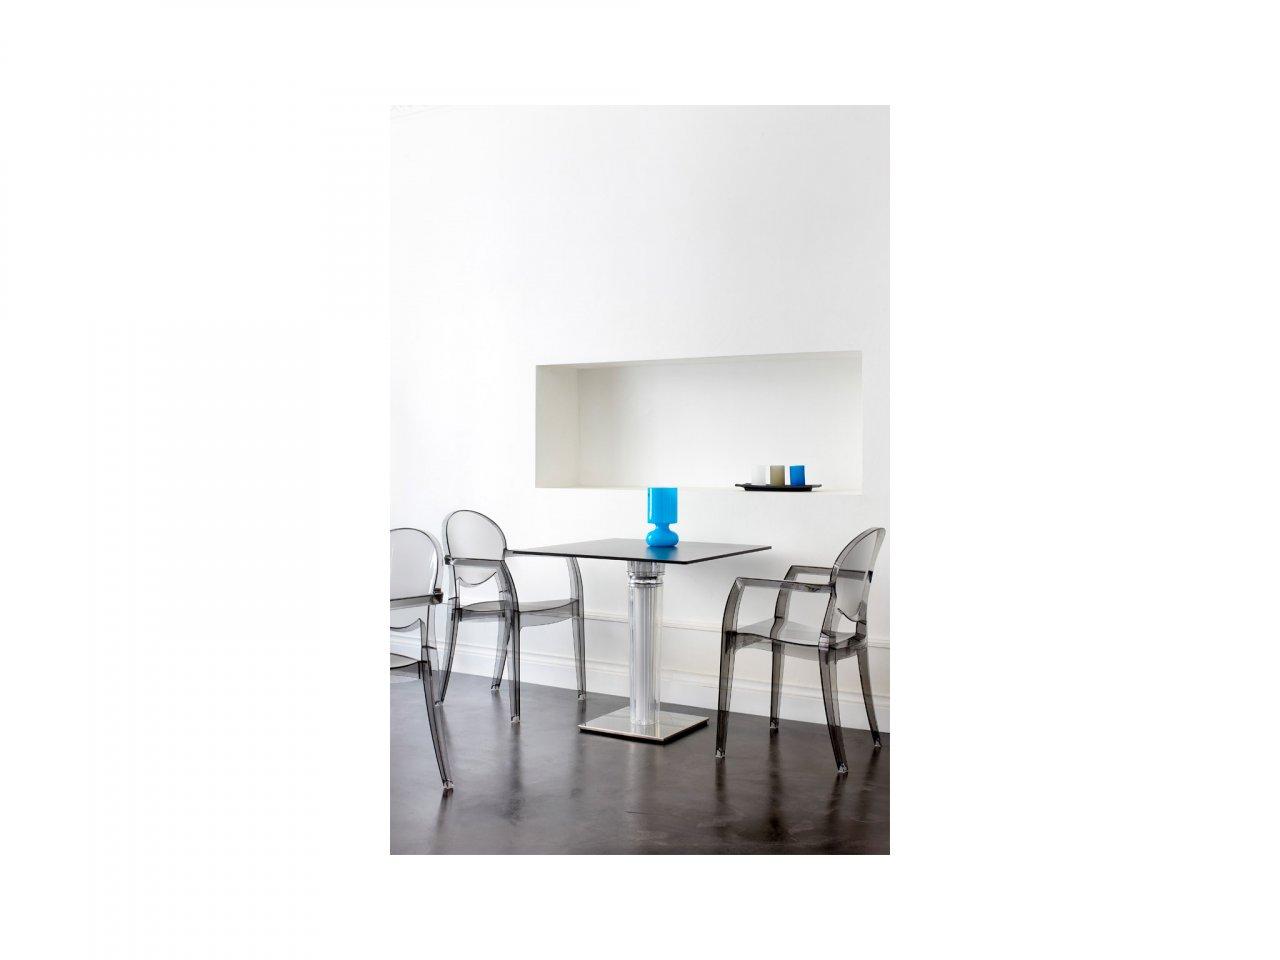 Sedia Con Braccioli Igloo - v3